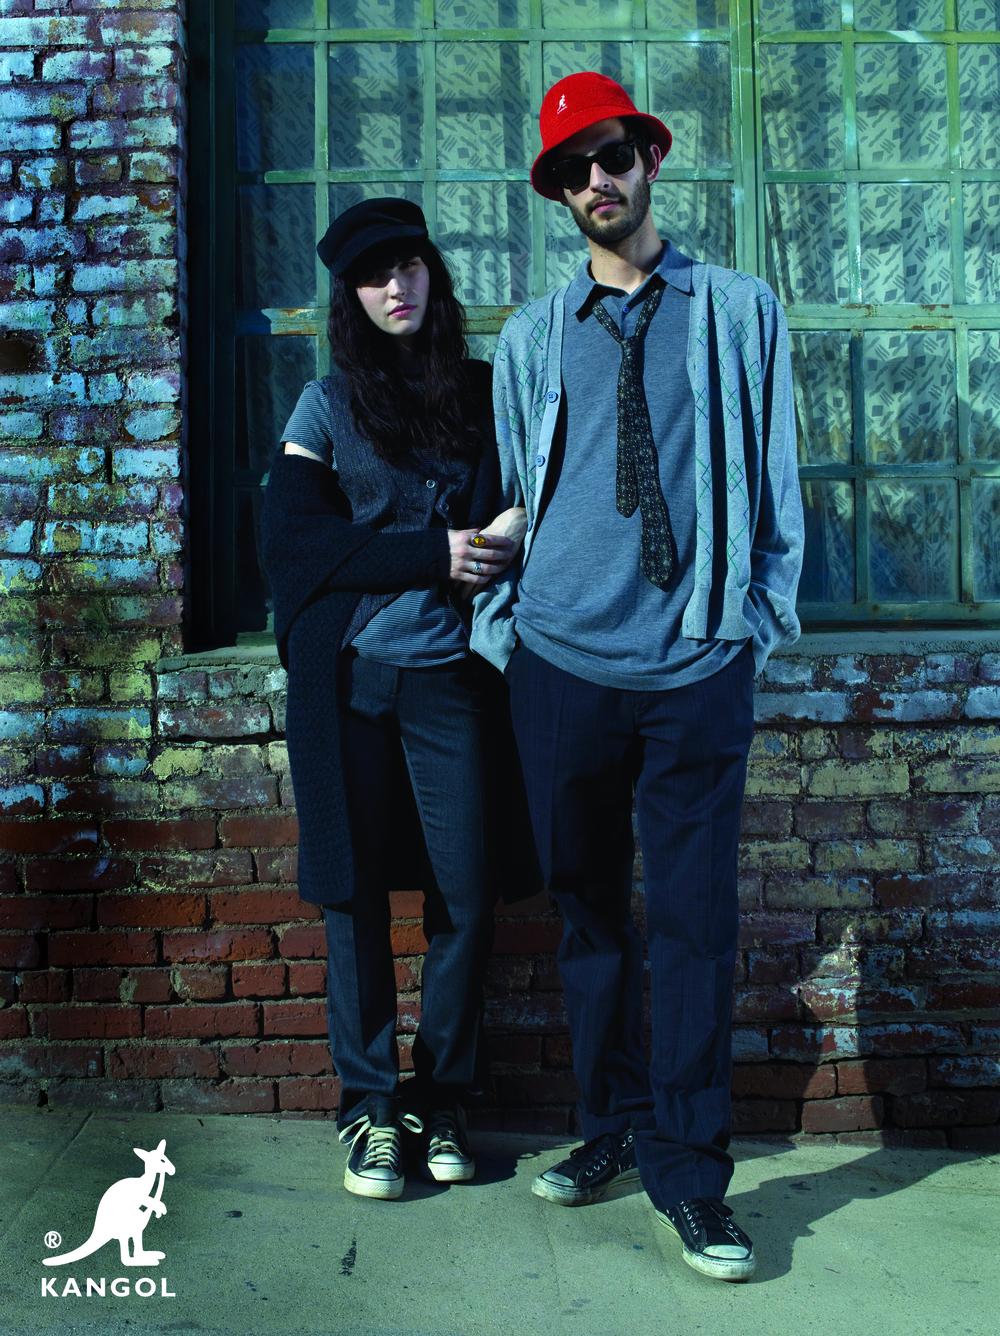 Kojii_Helnwein_Kangol_By_Lionel_Deluy_II.jpg